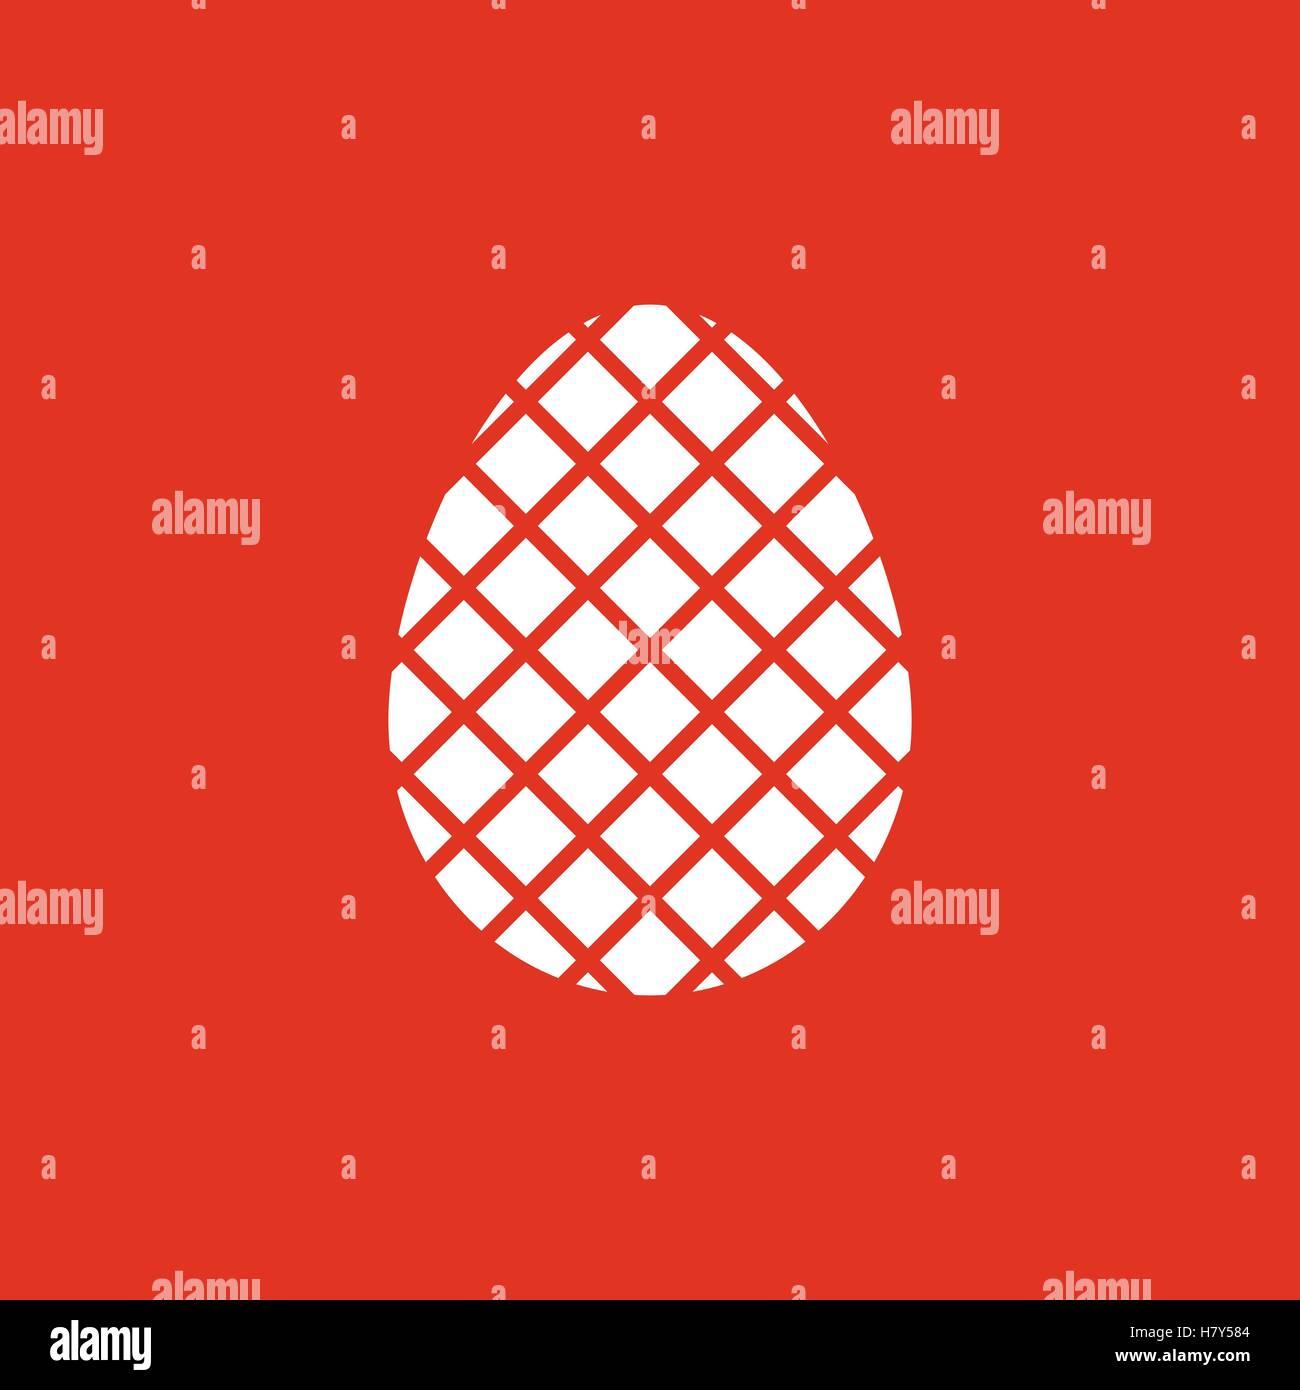 The egg icon easter egg symbol ui web logo sign flat design the egg icon easter egg symbol ui web logo sign flat design app stock vector buycottarizona